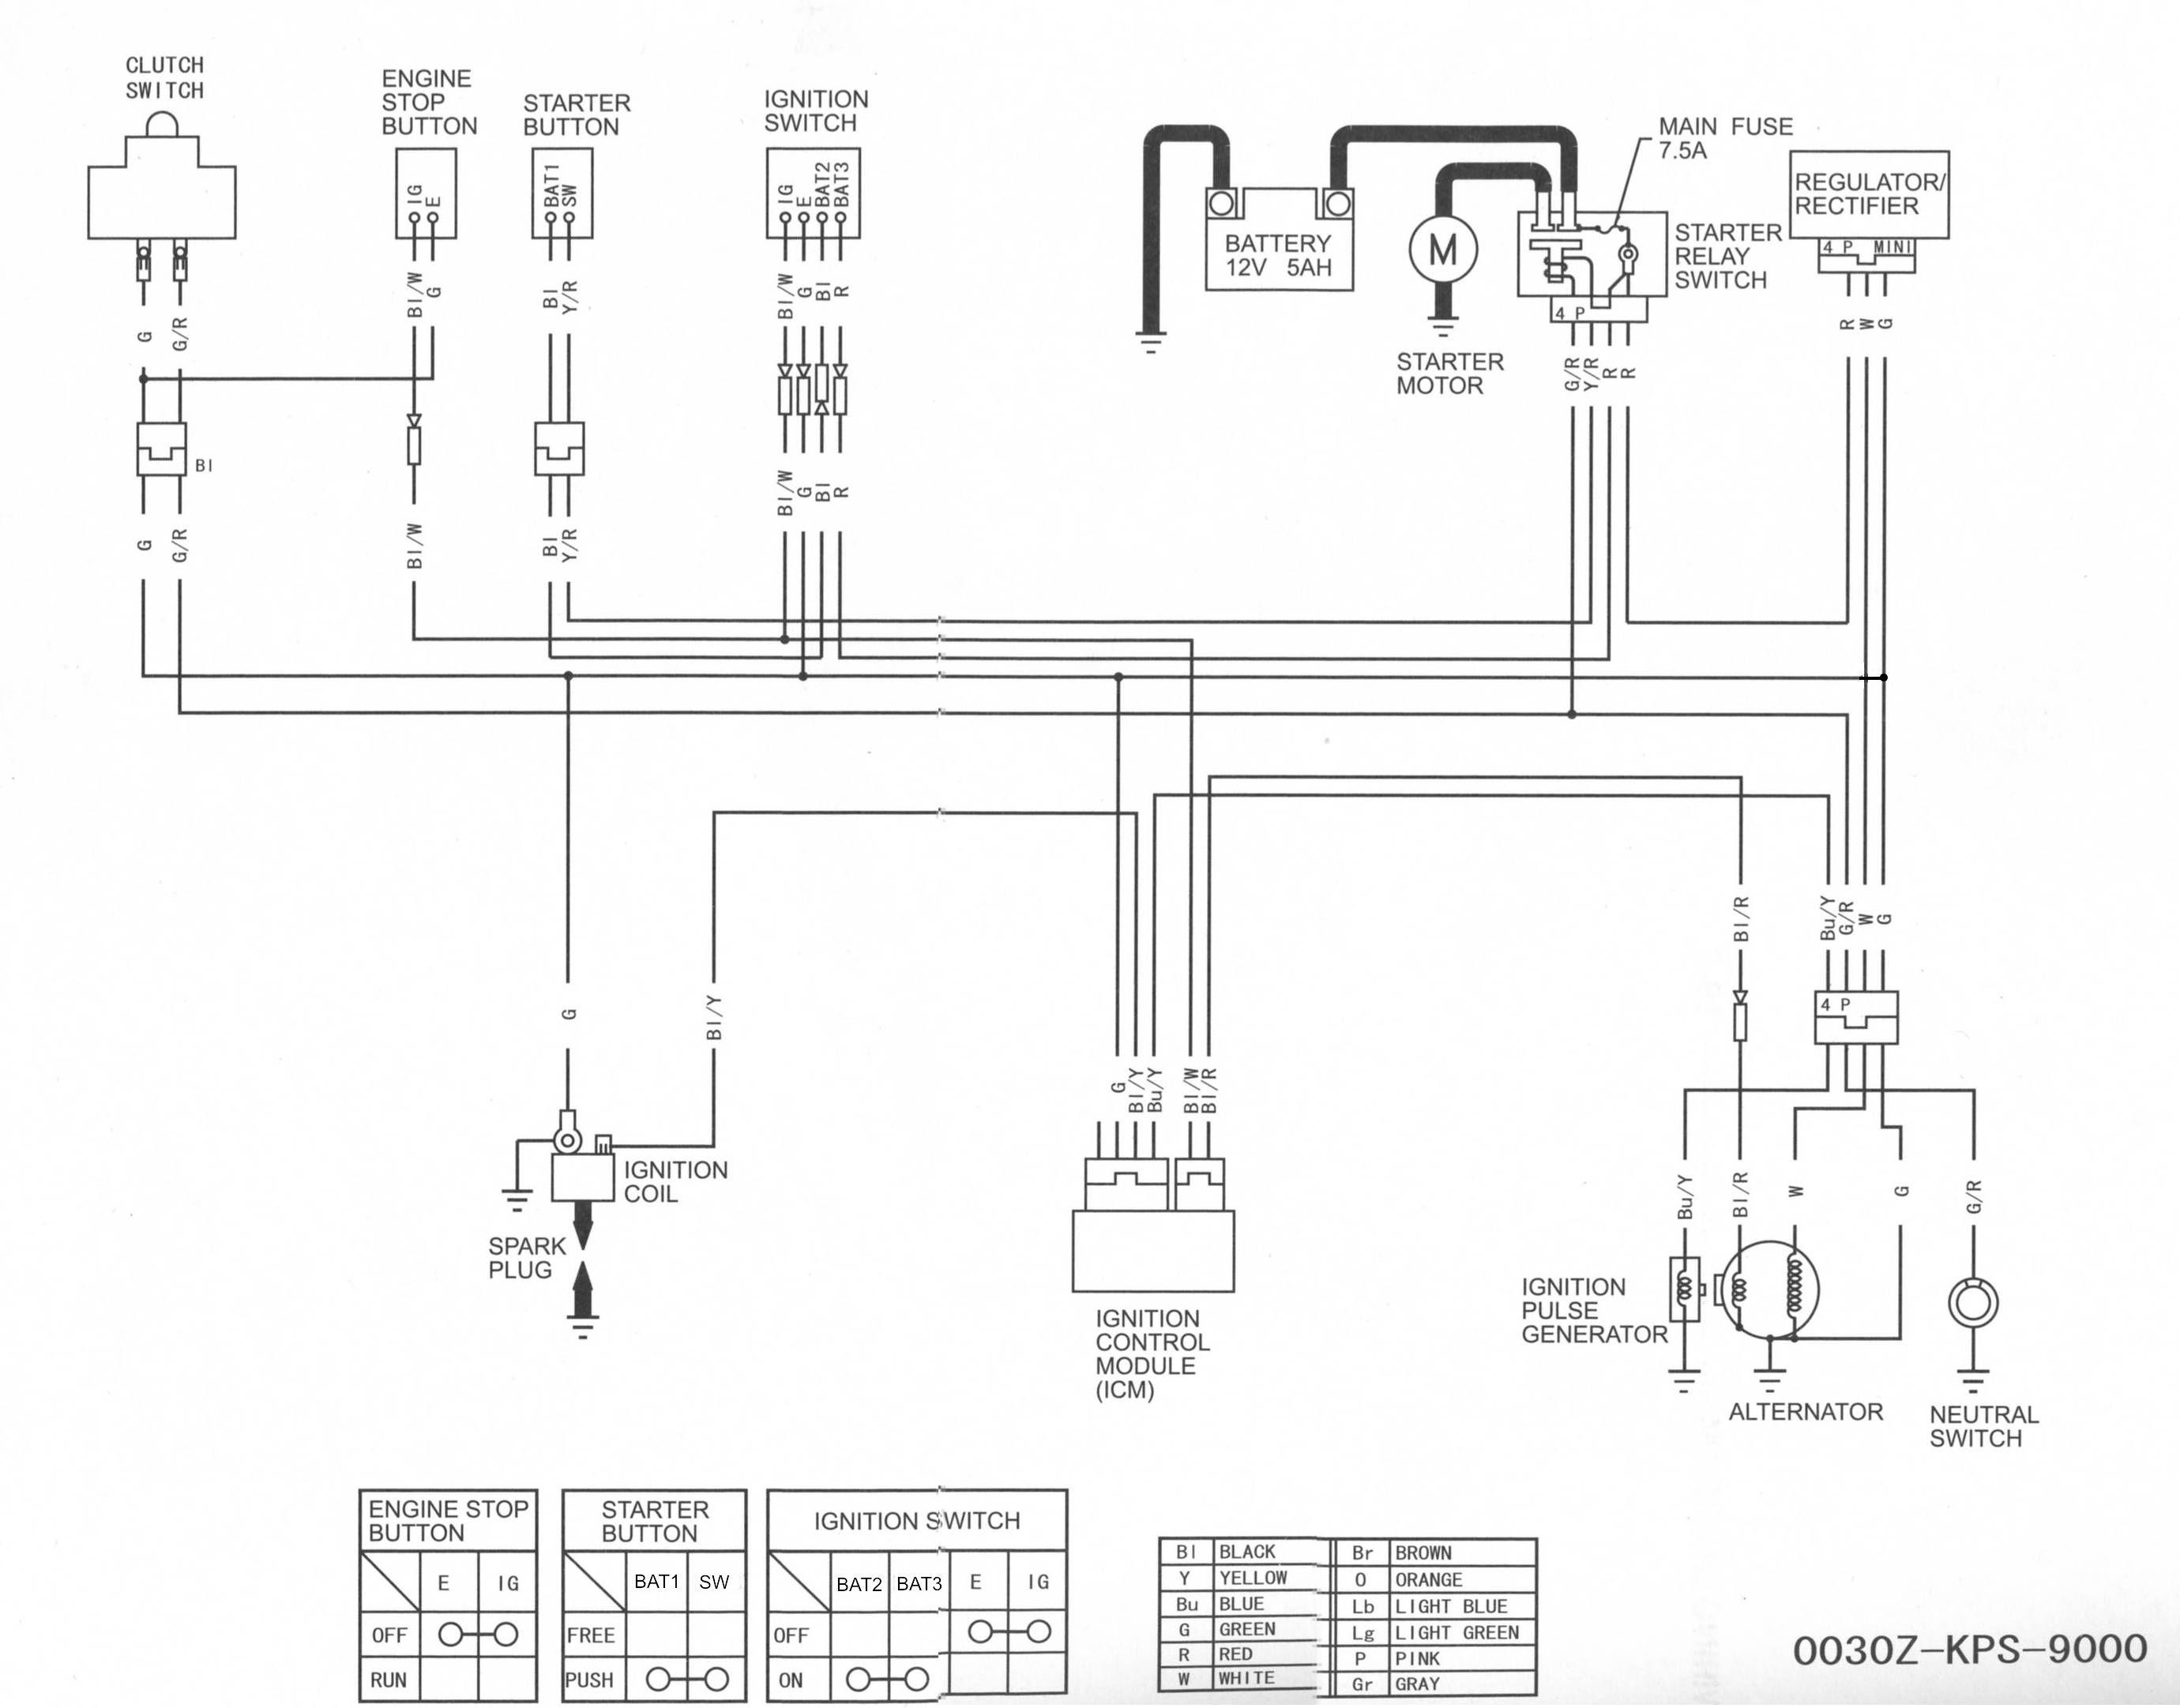 Honda 250x Wiring Diagram - Ge Refrigerator Wiring Diagram -  source-auto4.1982dodge.pistadelsole.it   Trx250x Wiring Diagram      Pista del Sole